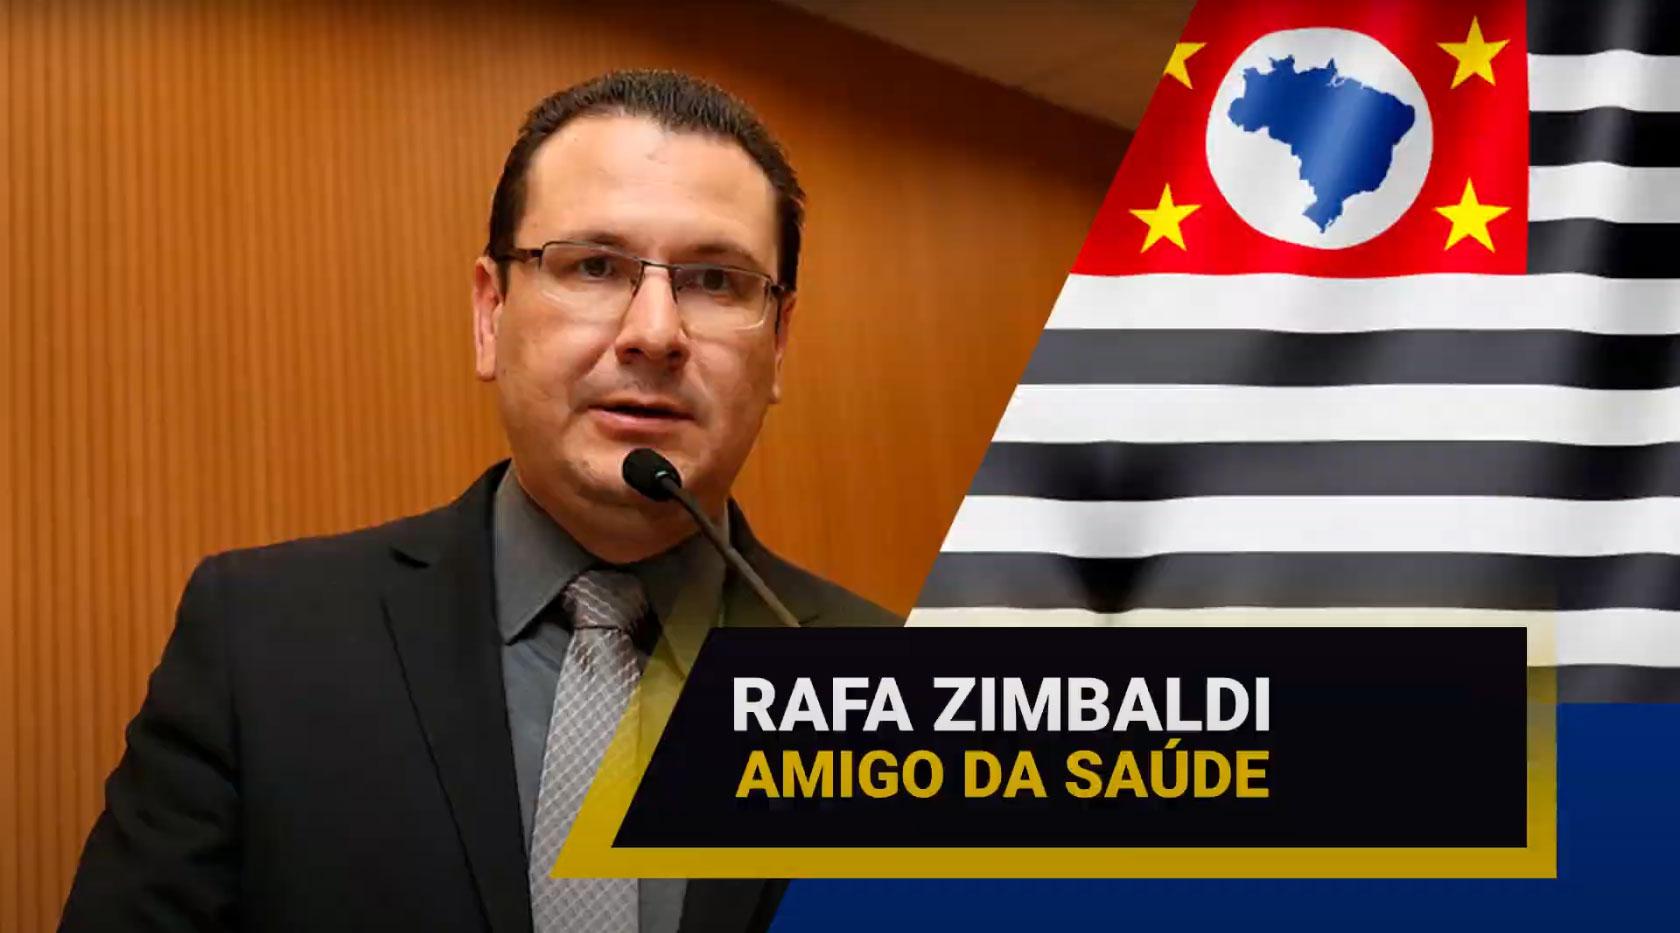 deputado-estadual-rafa-zimbaldi-e-amigo-da-saude - Acao Comunicativa